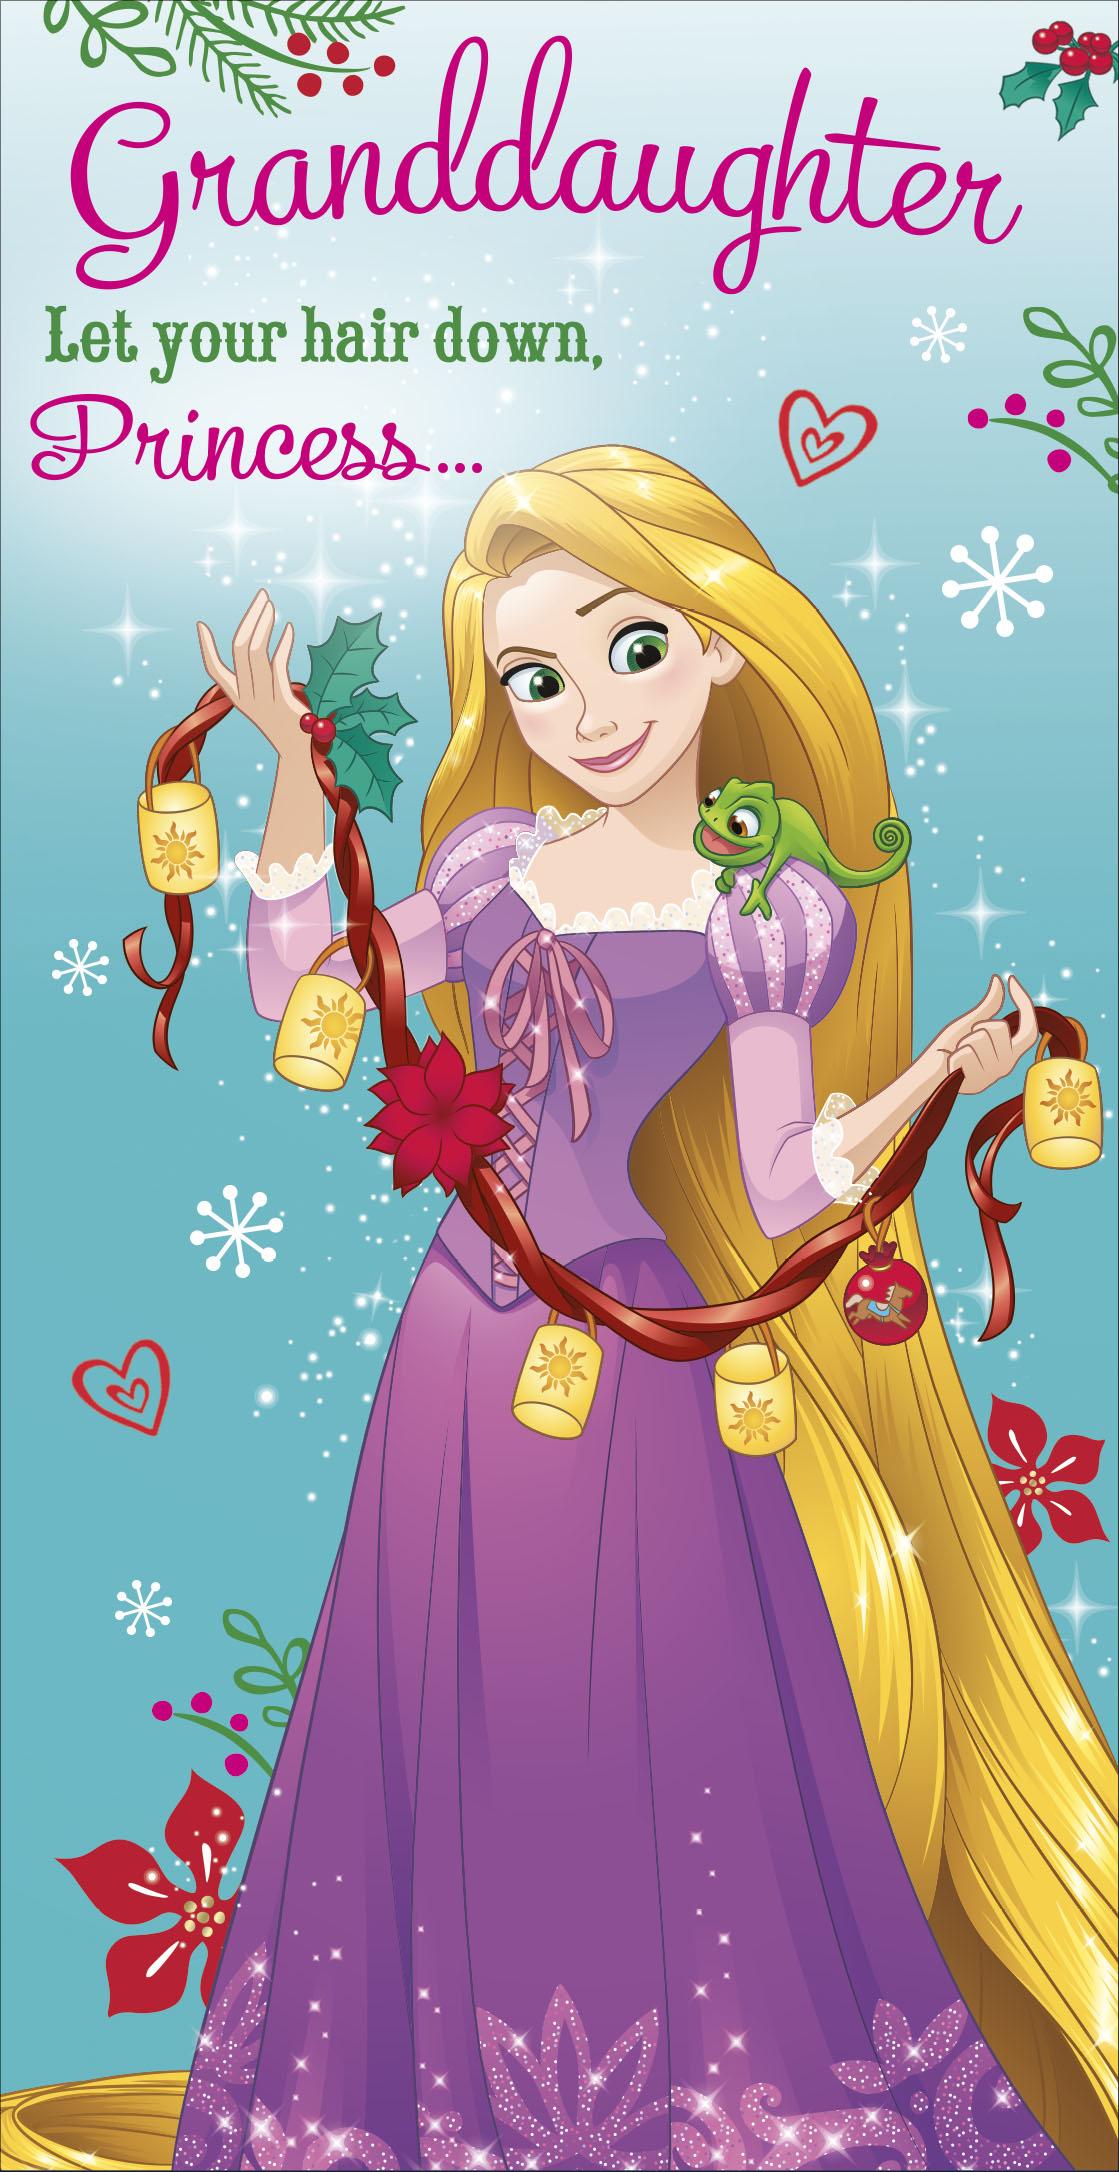 GRANDAUGHTER GIRL CHRISTMAS XMAS MONEY GIFT PRESENT WALLET GREETING CARD